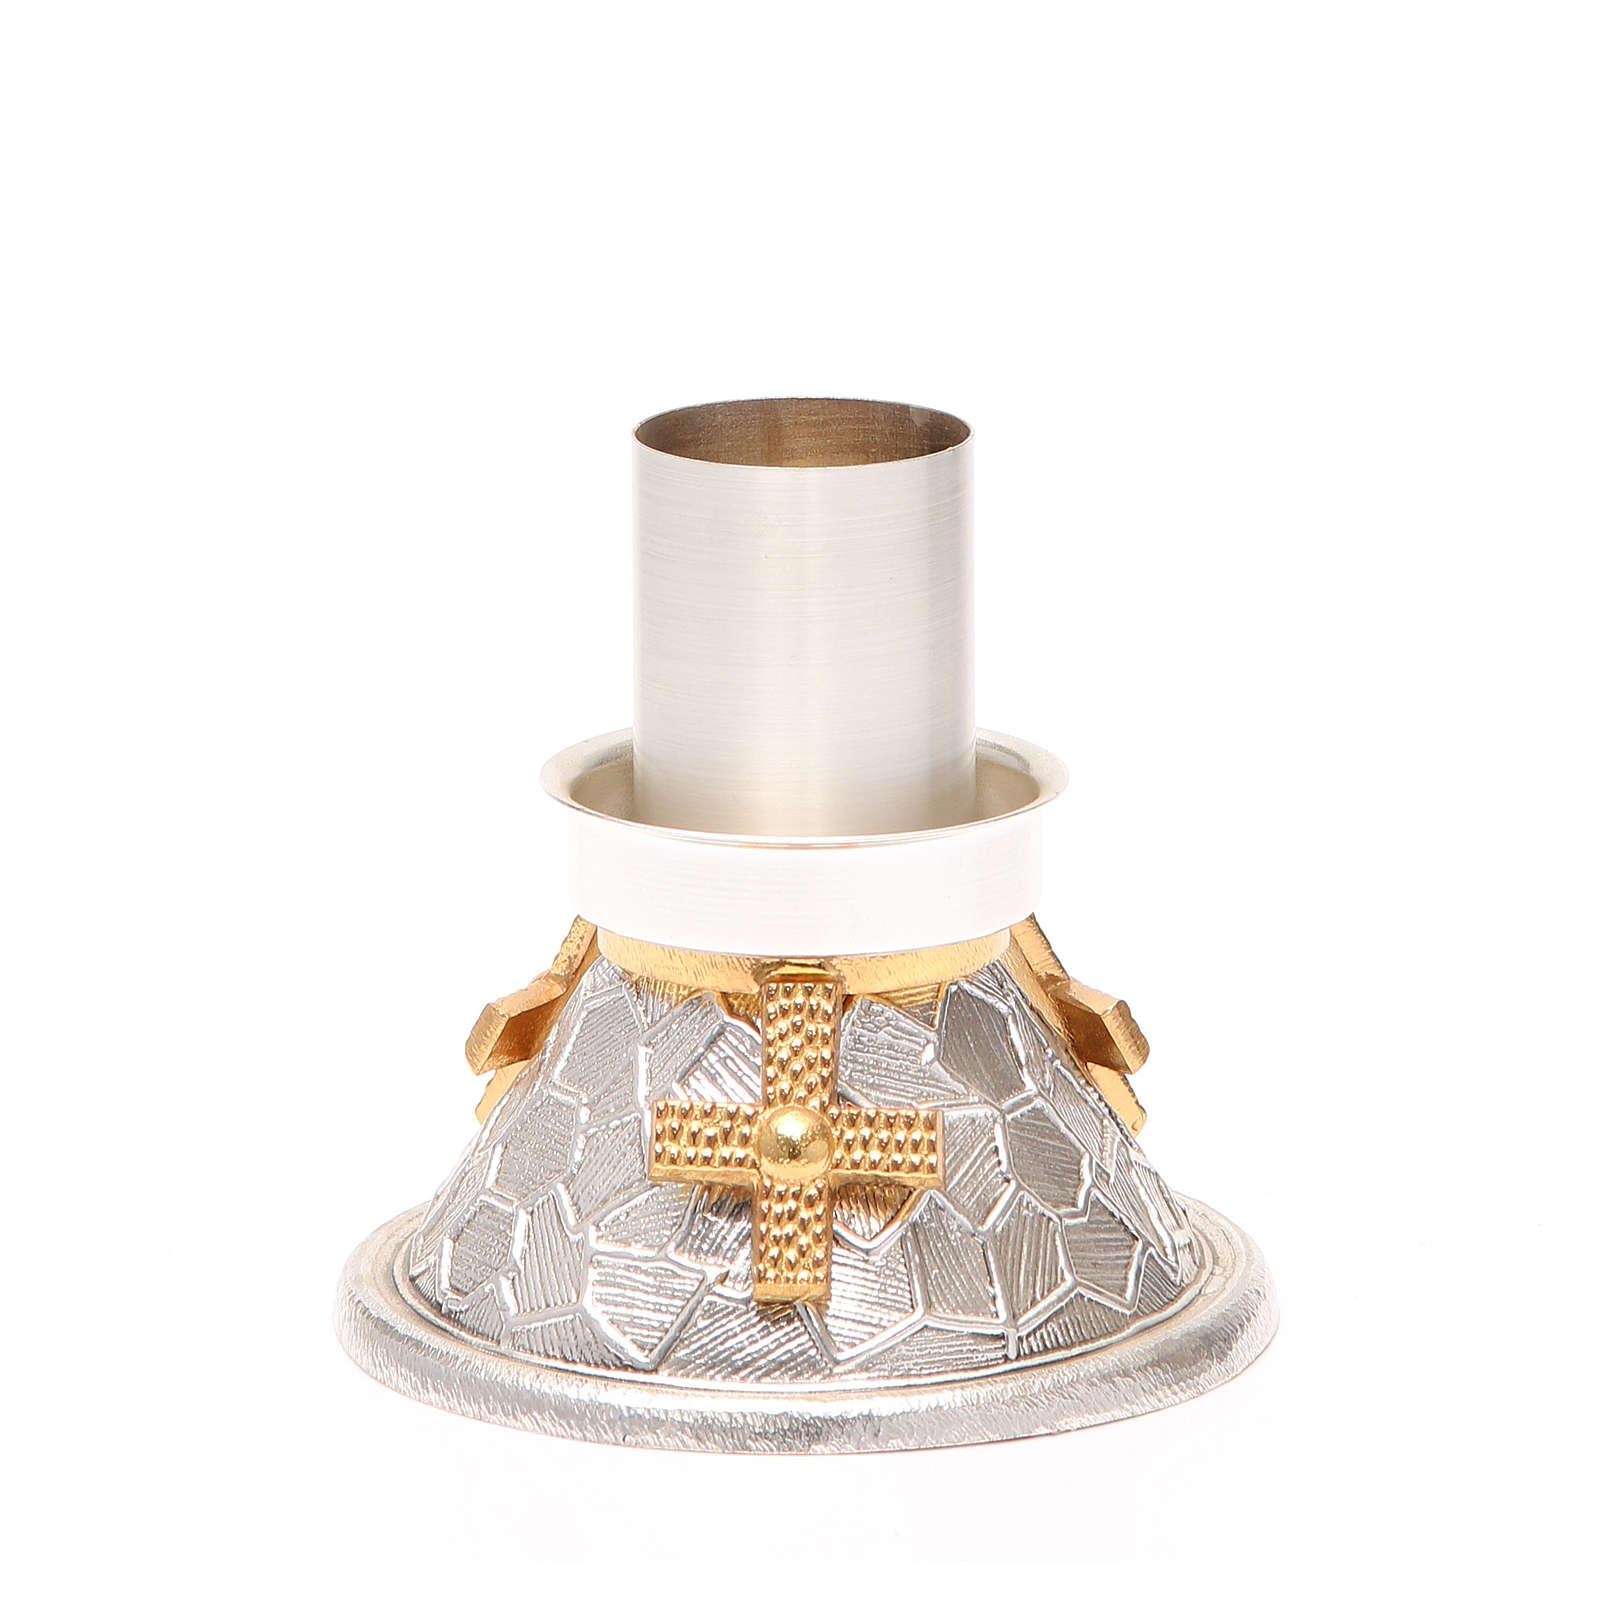 Portacandela bronzo argentato croce dorata 4